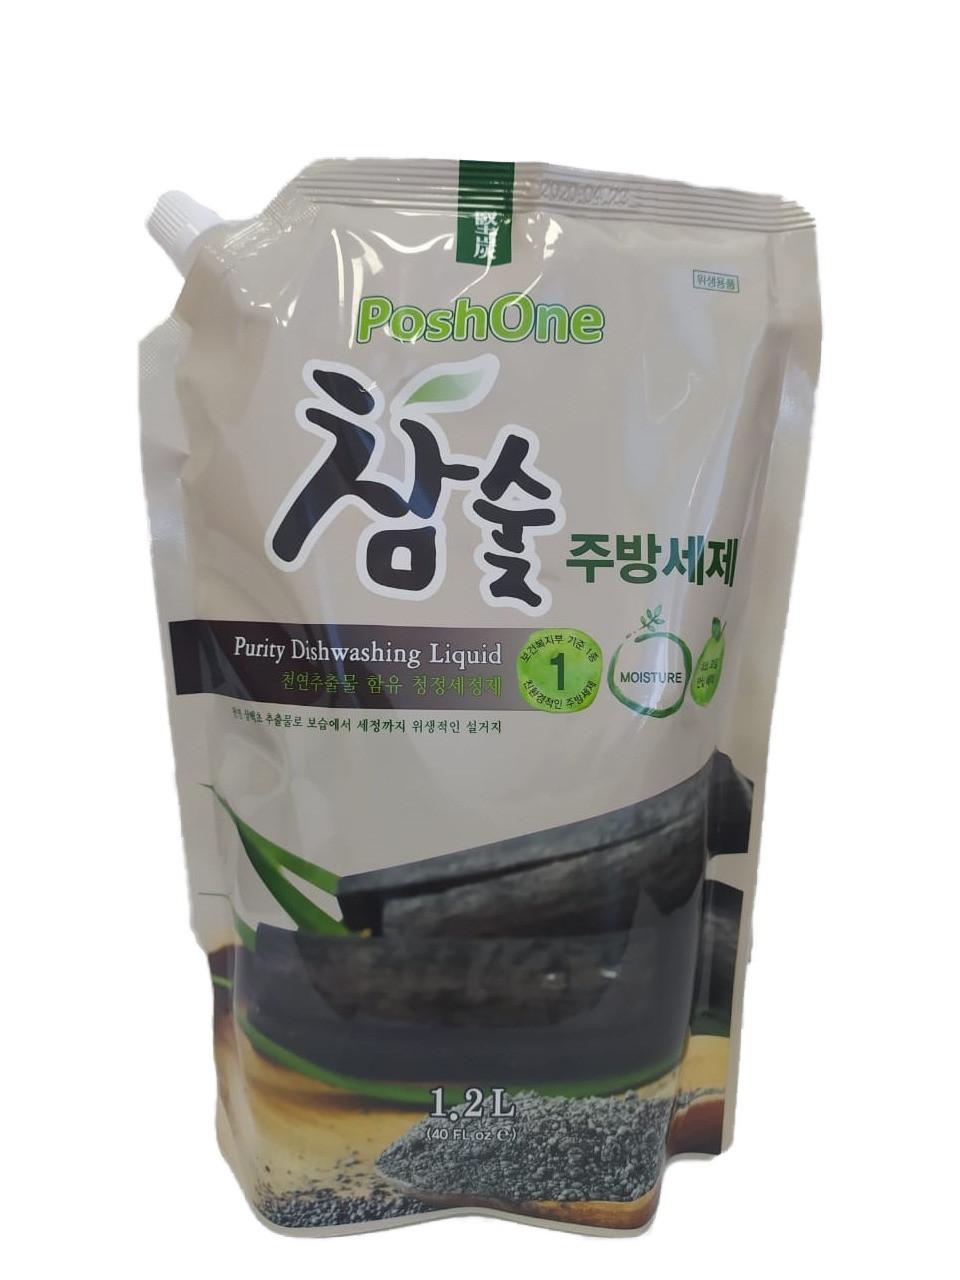 Poshone Charcoal Purity Dishwashing Liquid Средство для Мытья Посуды с Древесным Углем 1200мл.